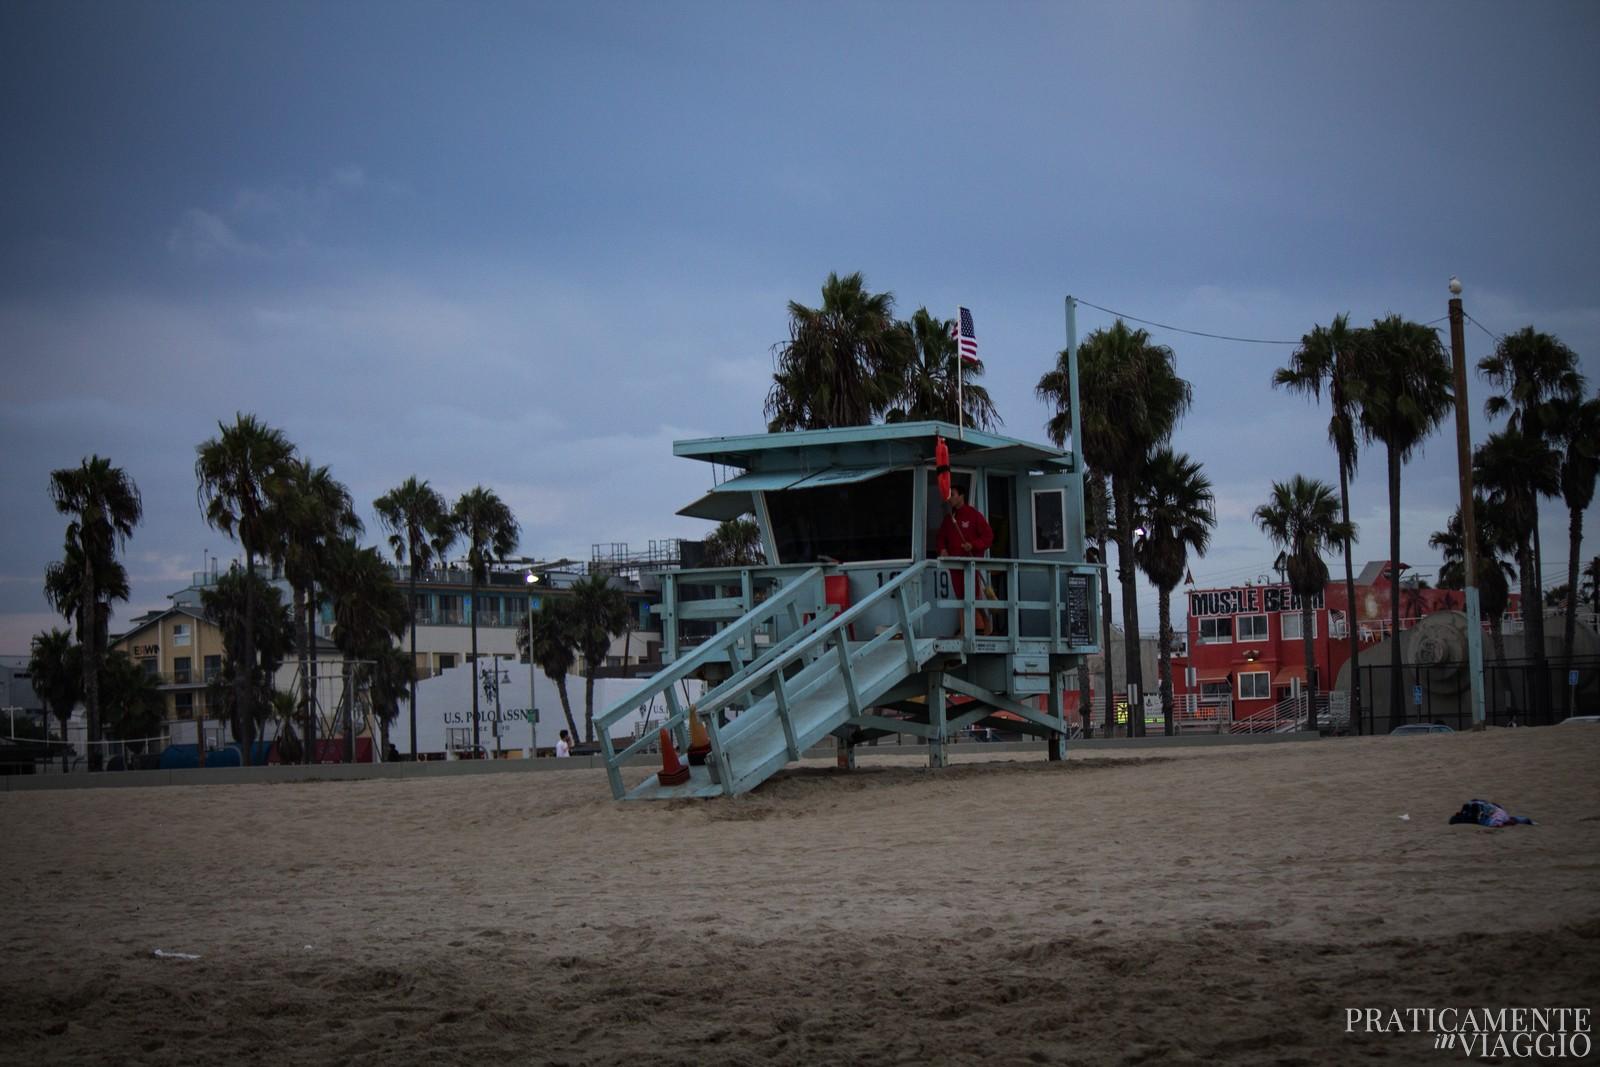 Torretta dei baywatch a Venice beach